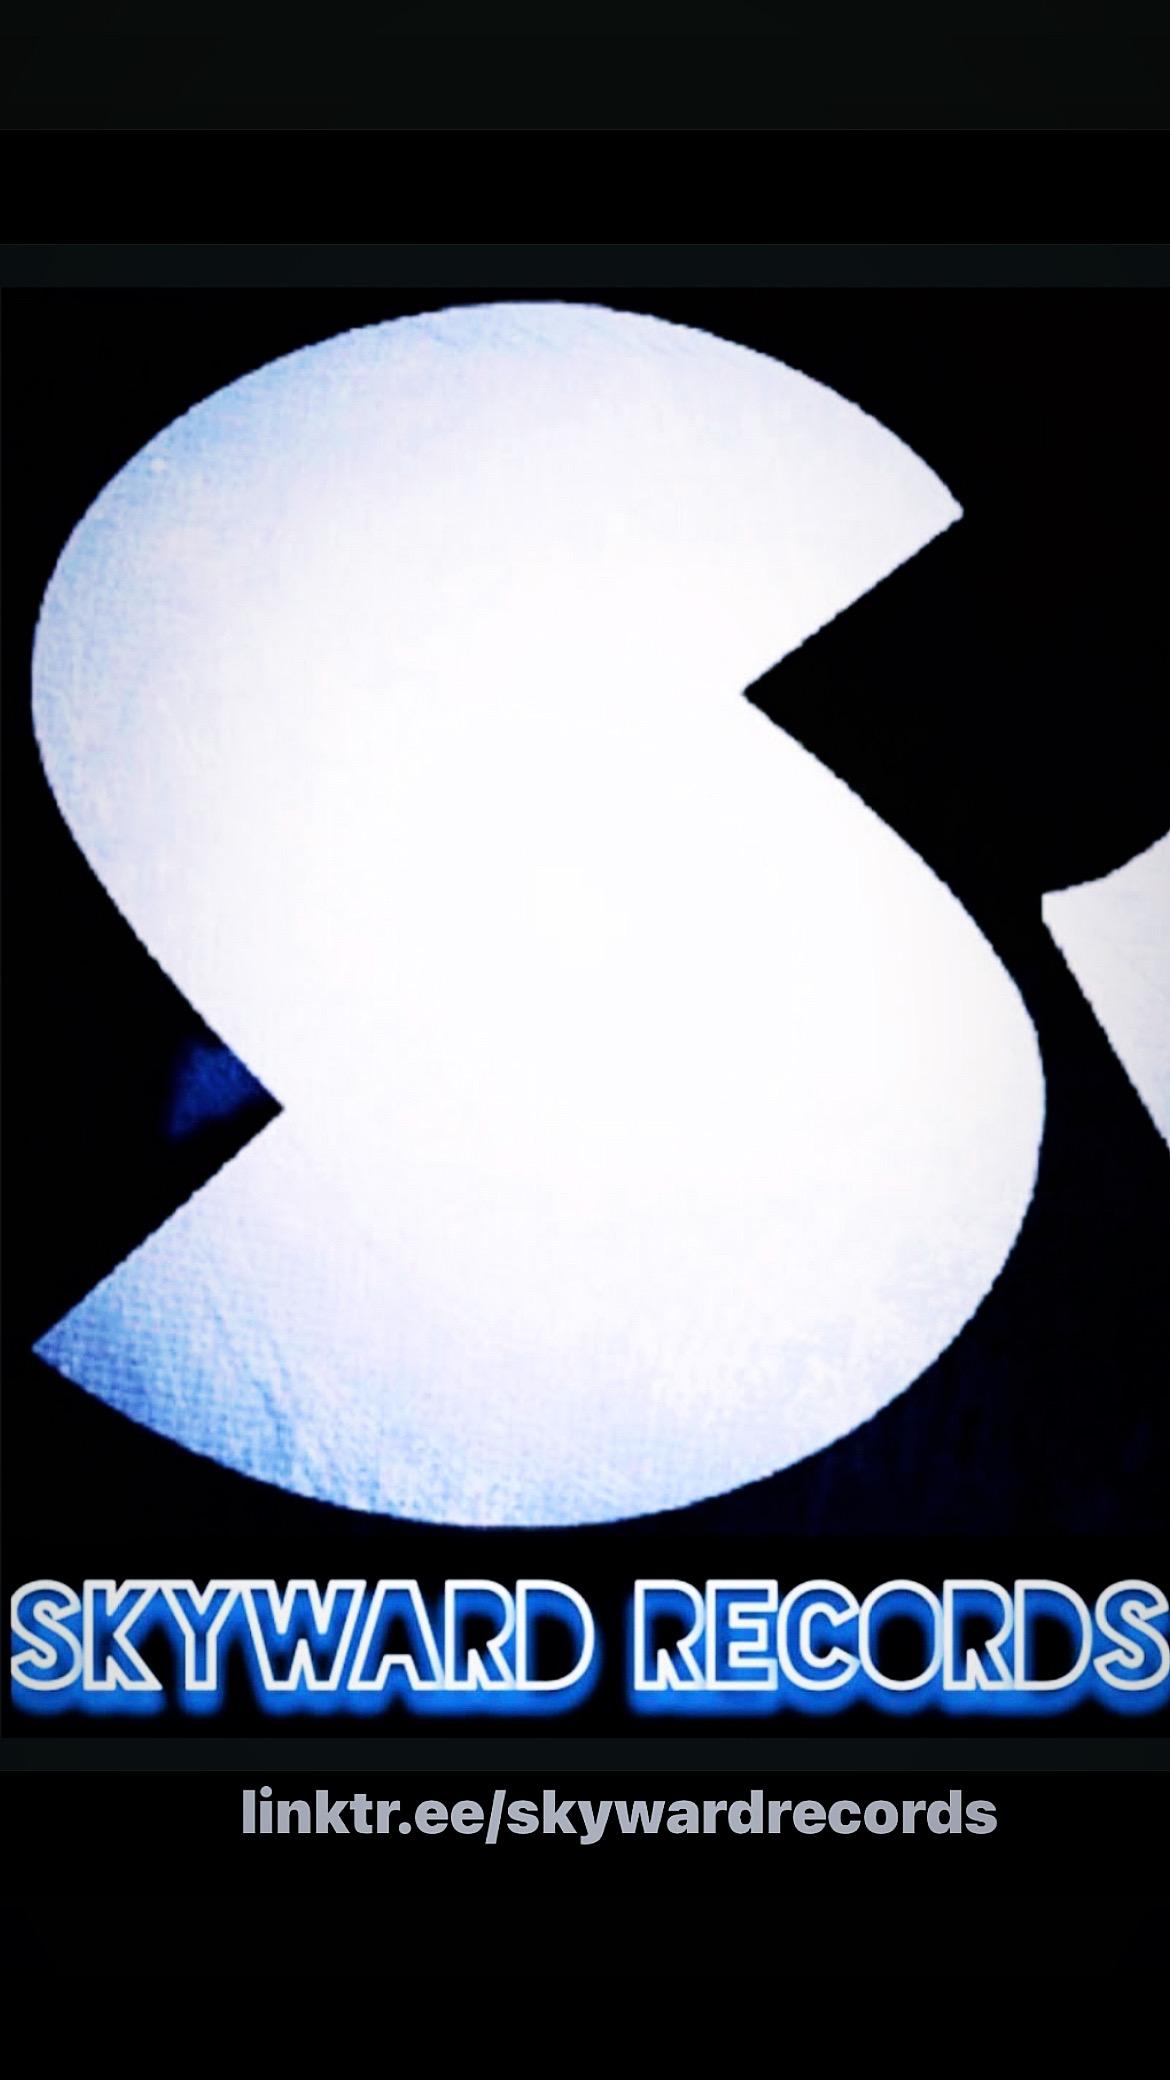 Skyward Recording Music Group